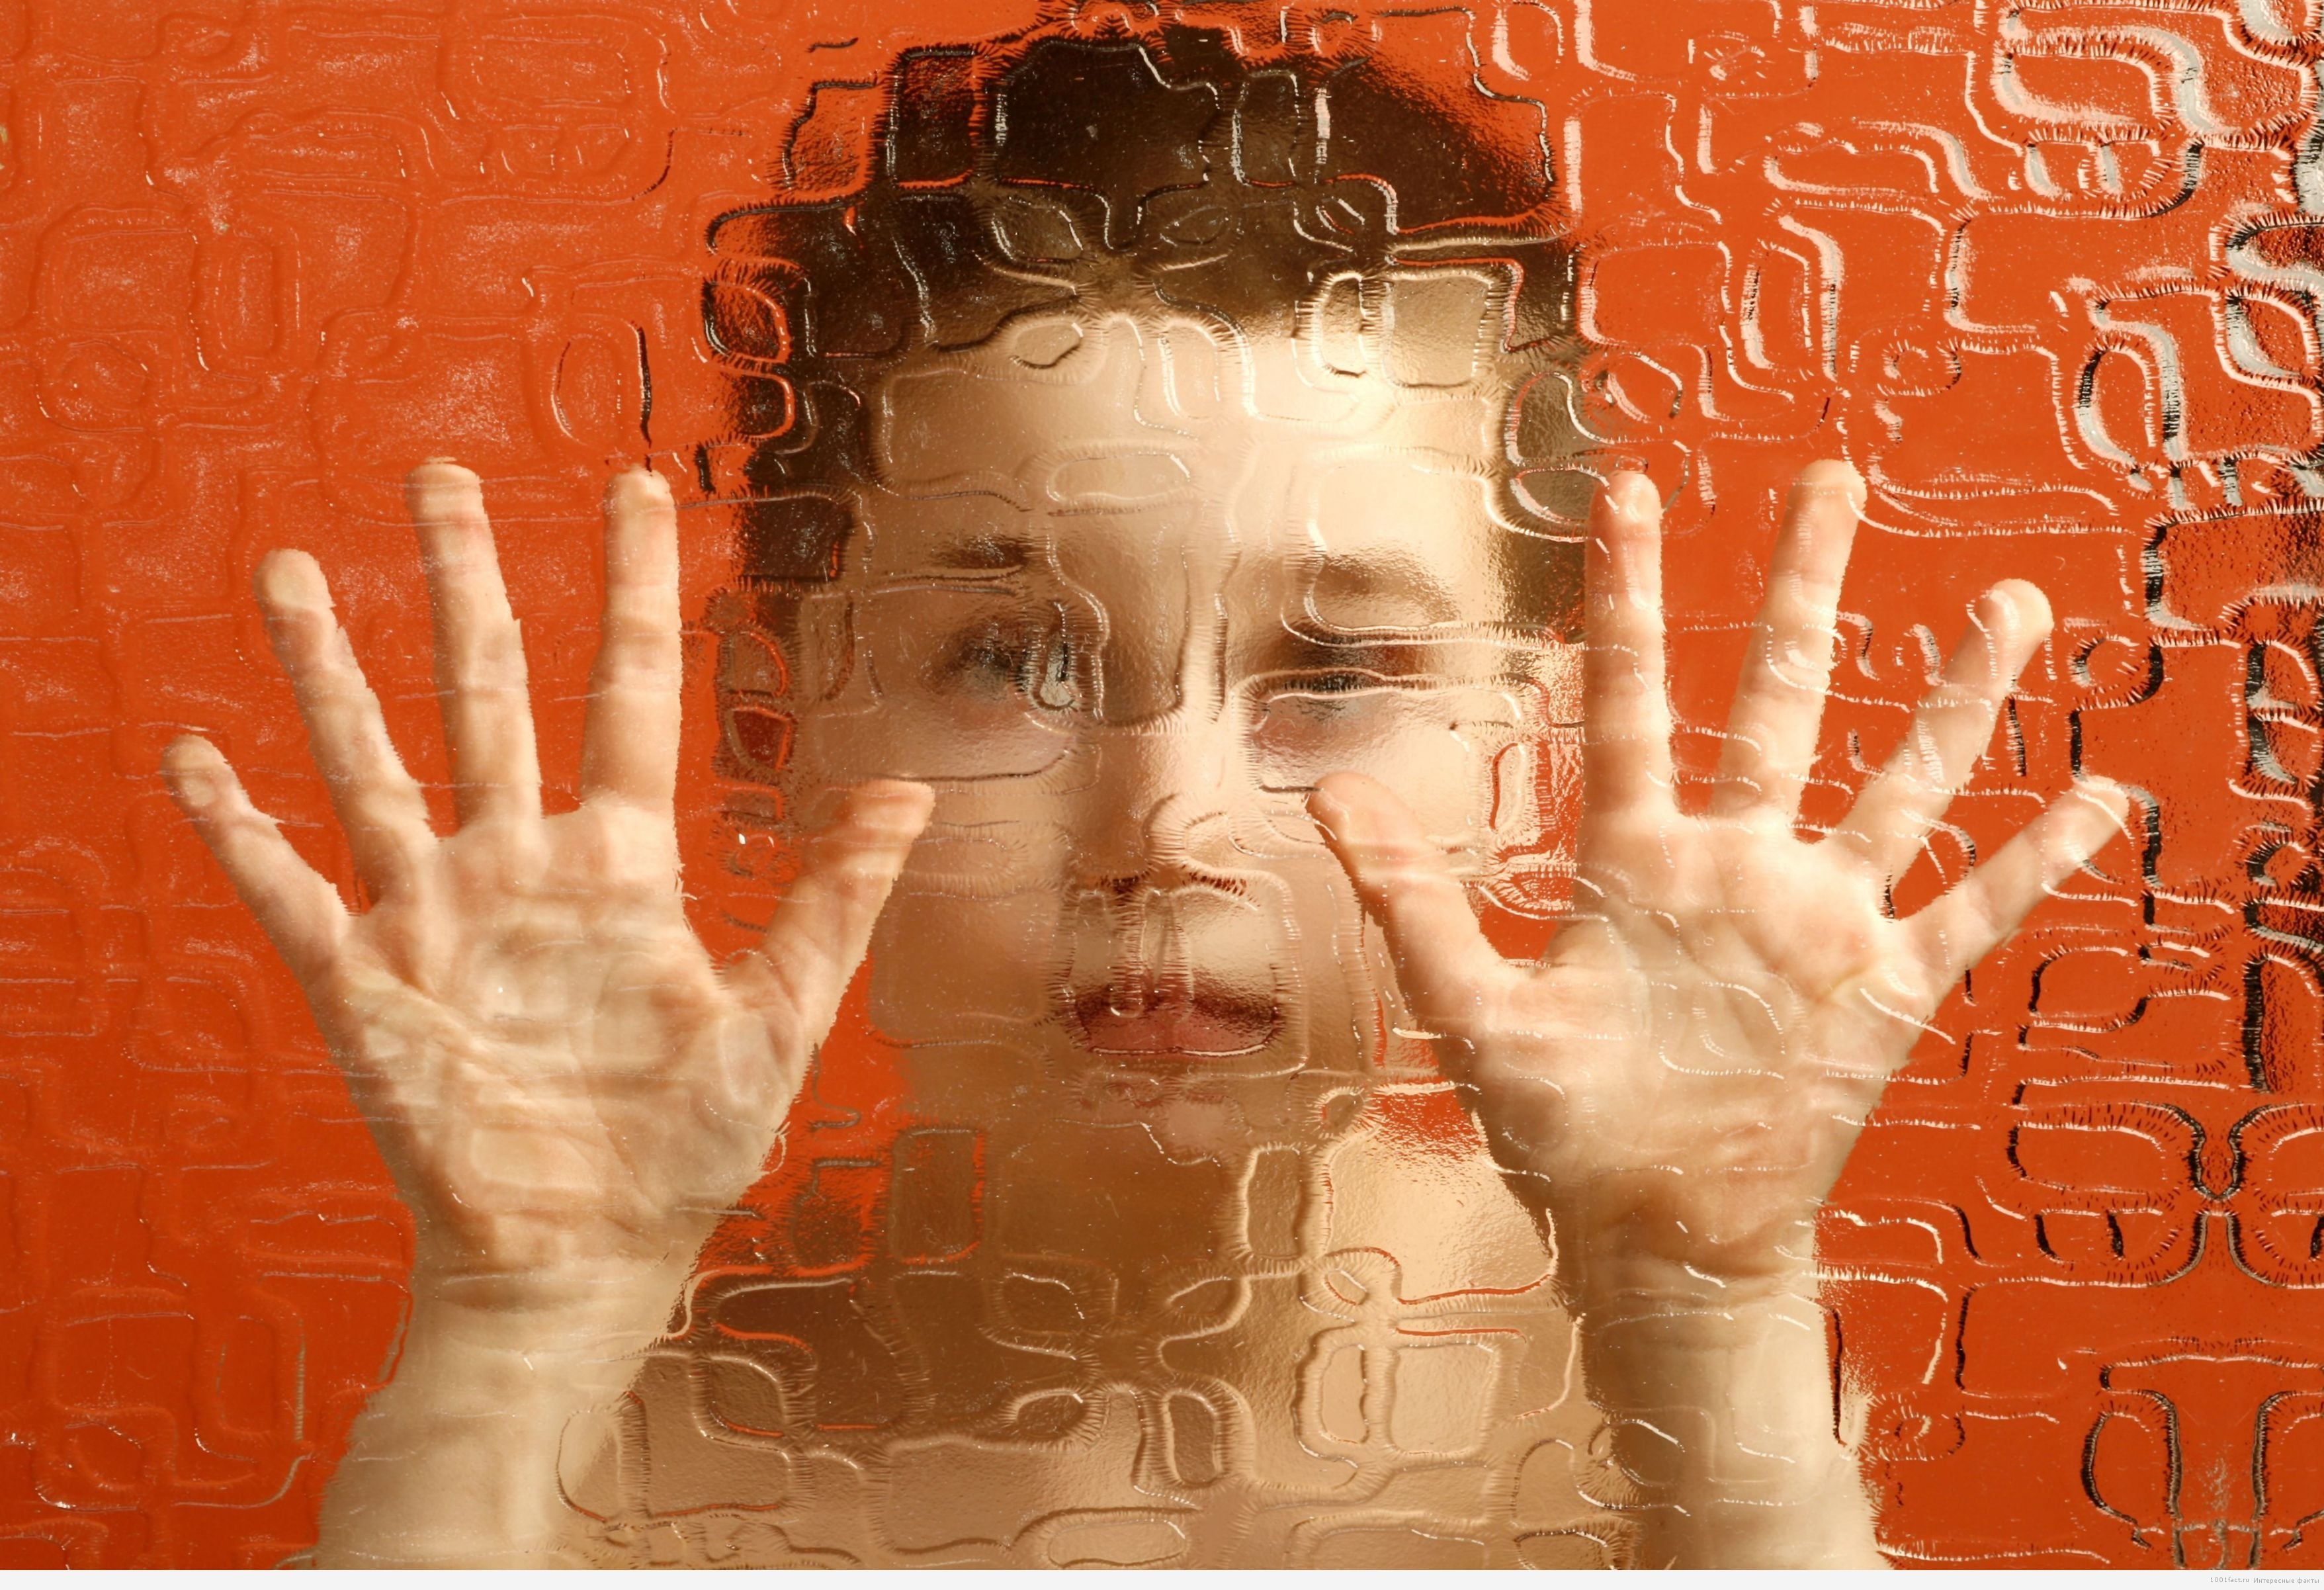 про аутизм